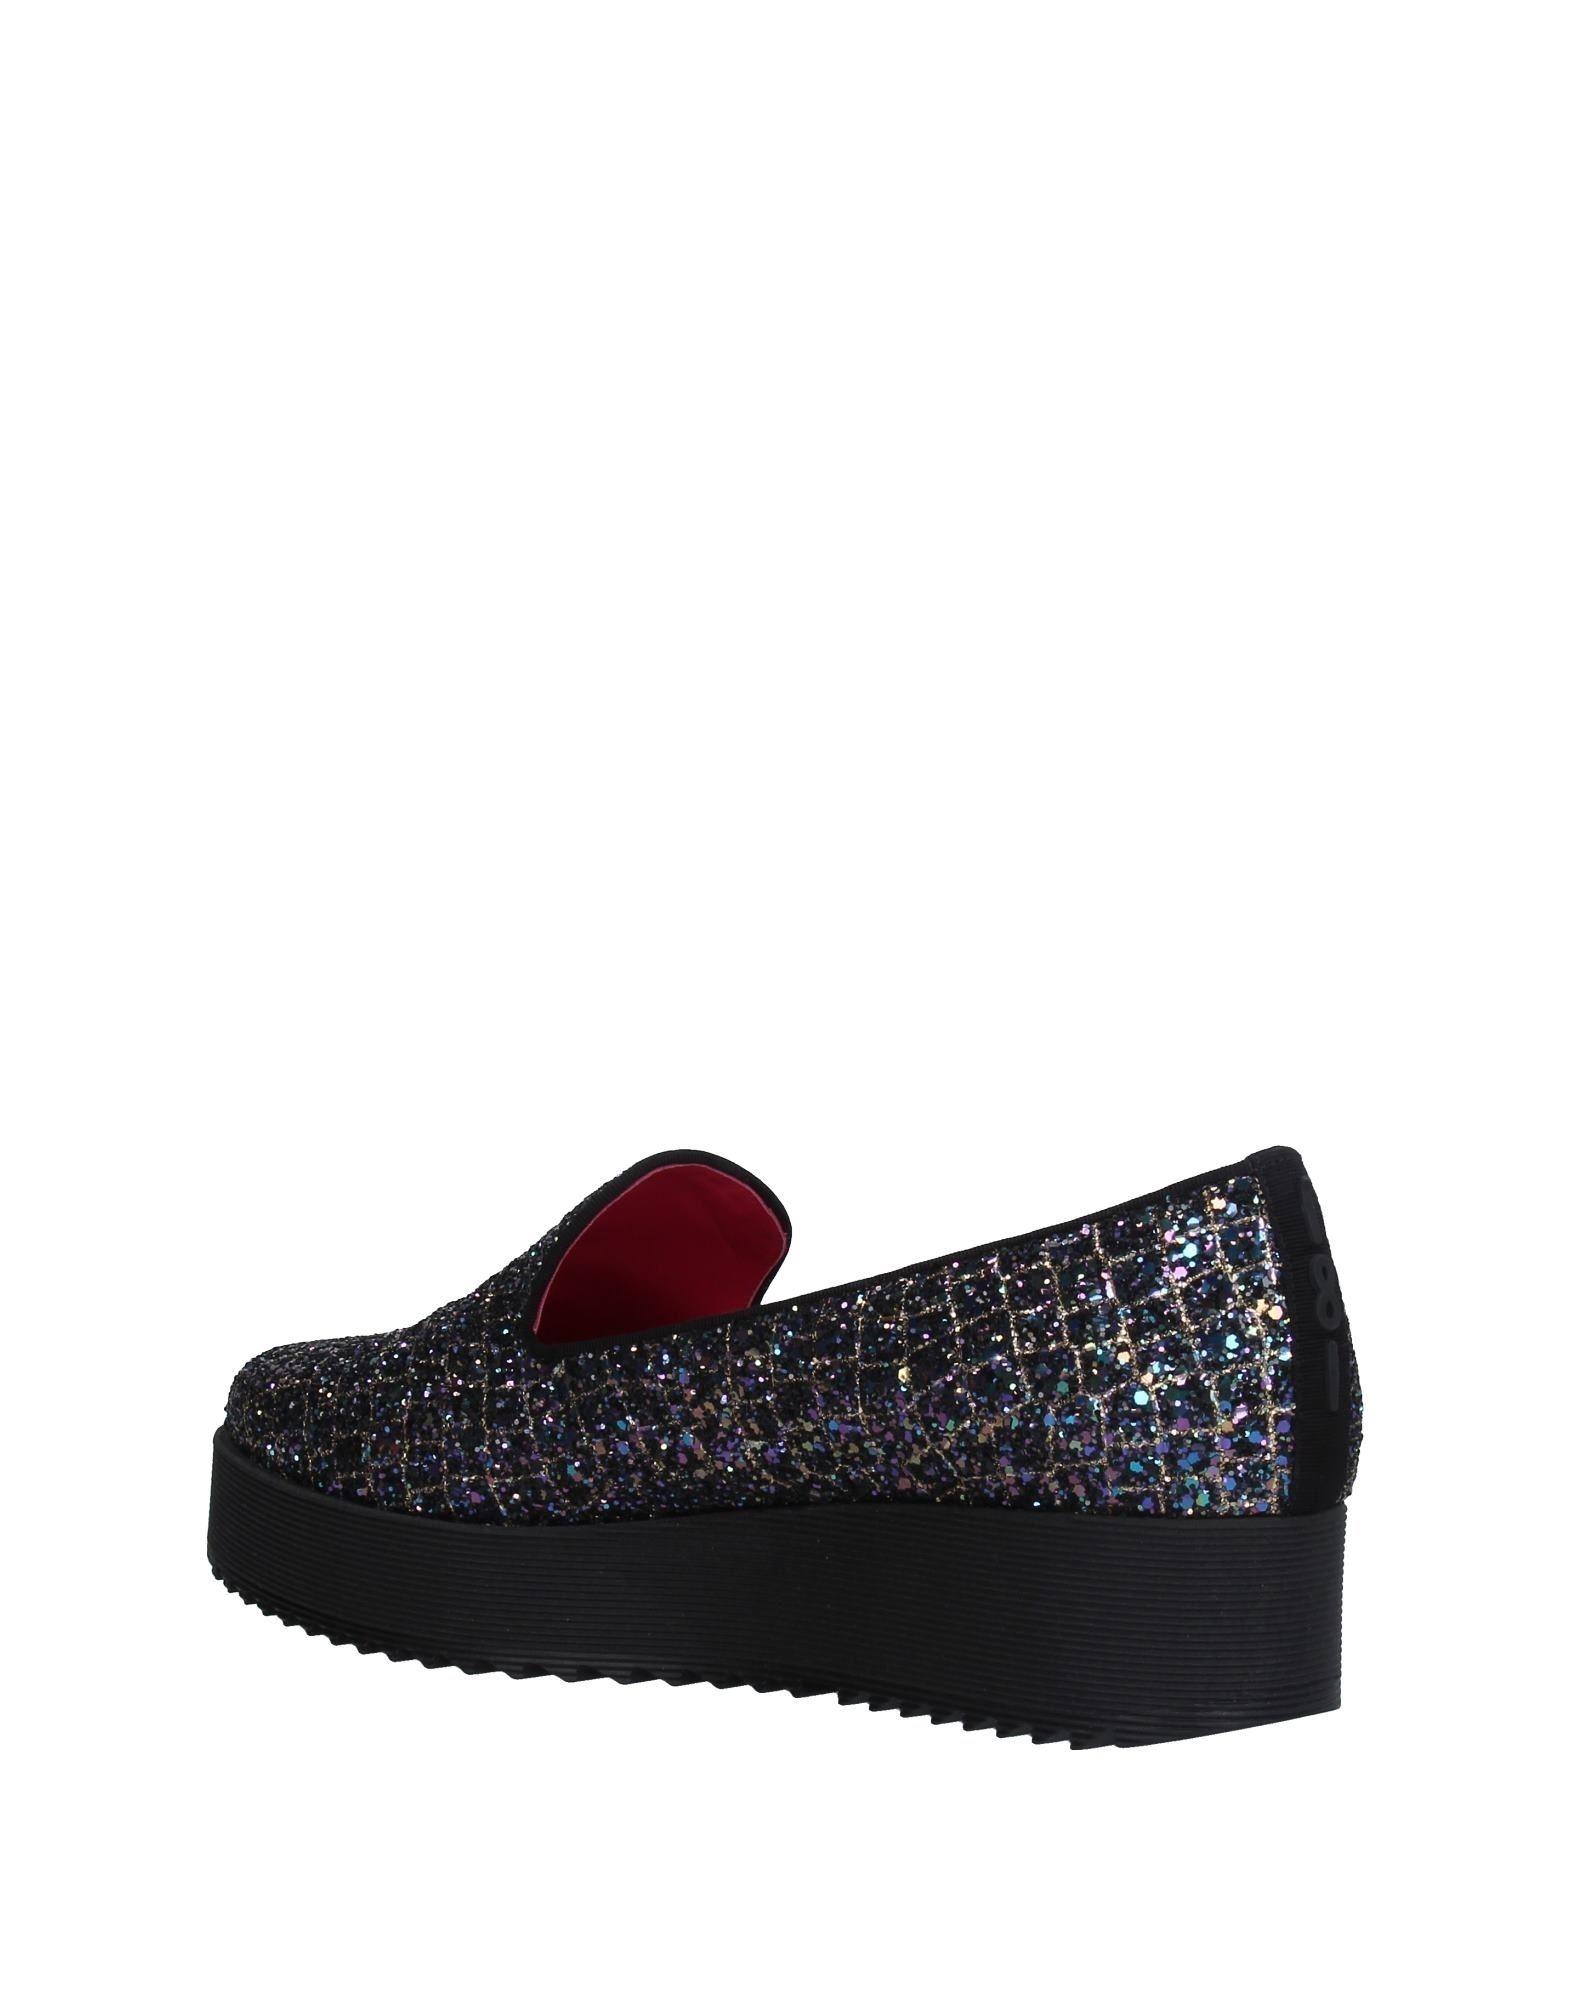 Gut um Sneakers billige Schuhe zu tragen181 By Alberto Gozzi Sneakers um Damen  11218413QD 06f330